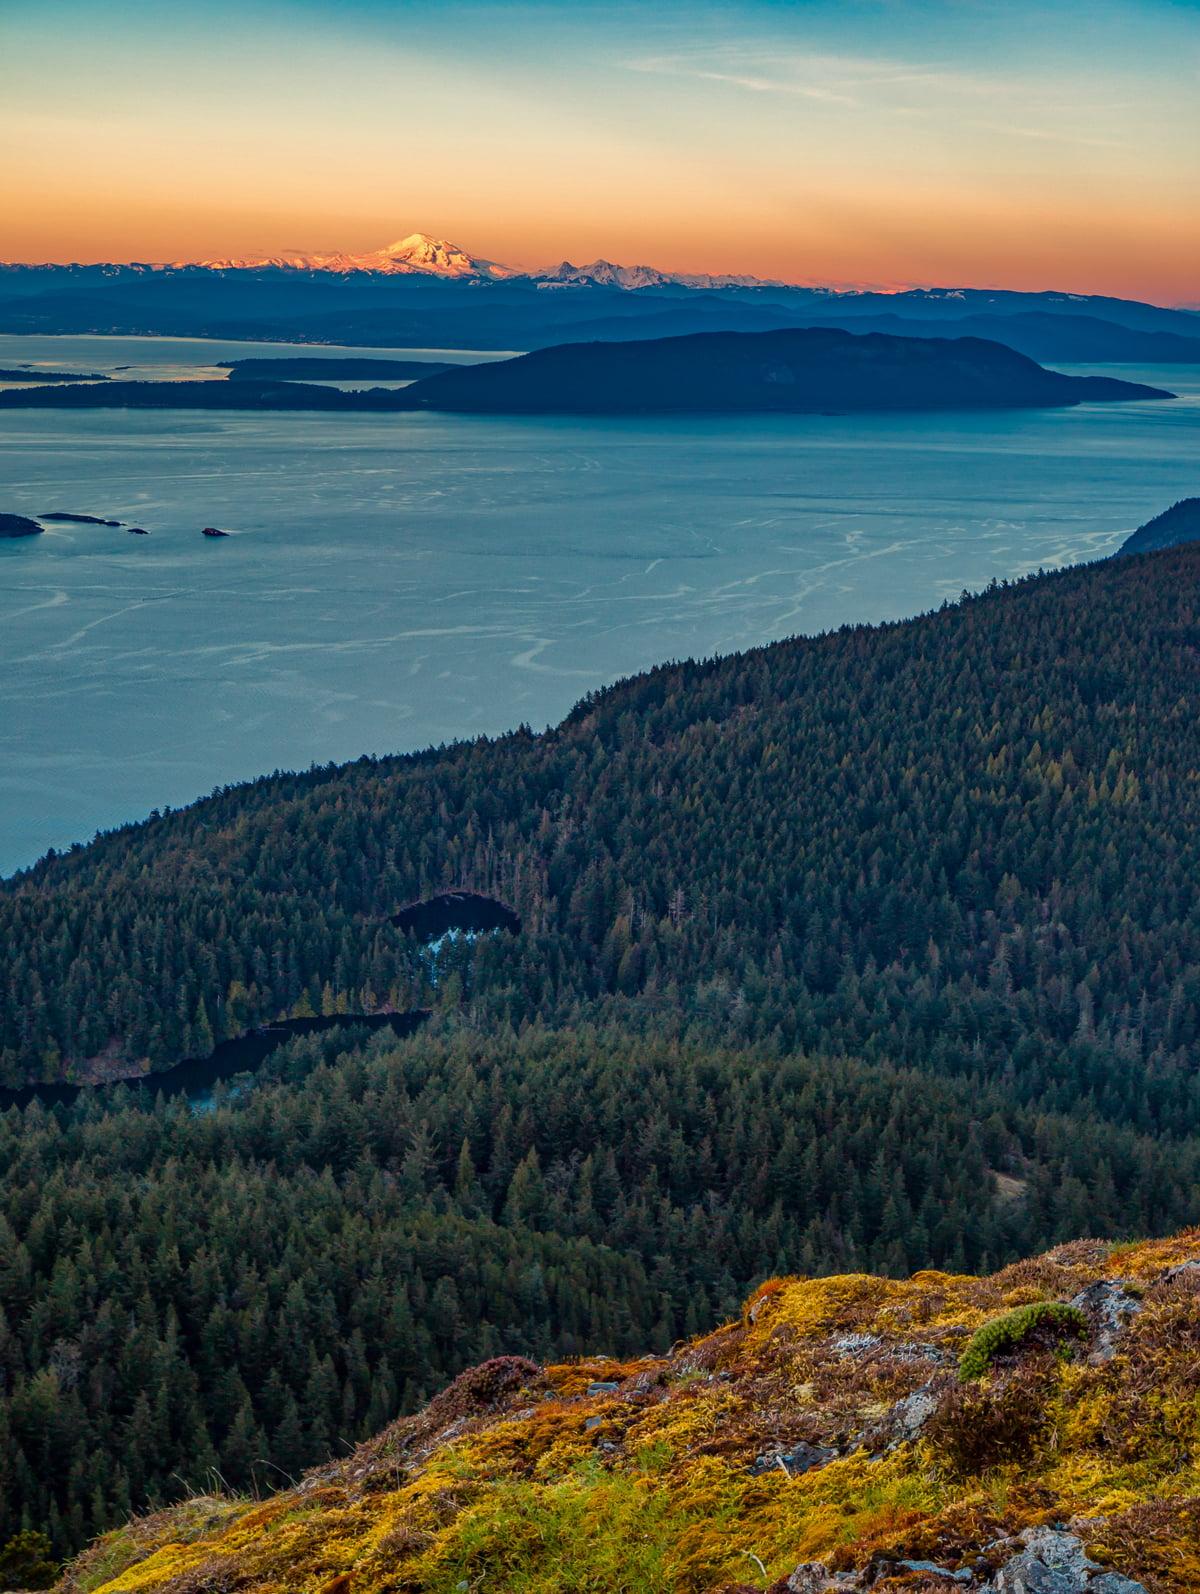 San Juan Islands, Washington